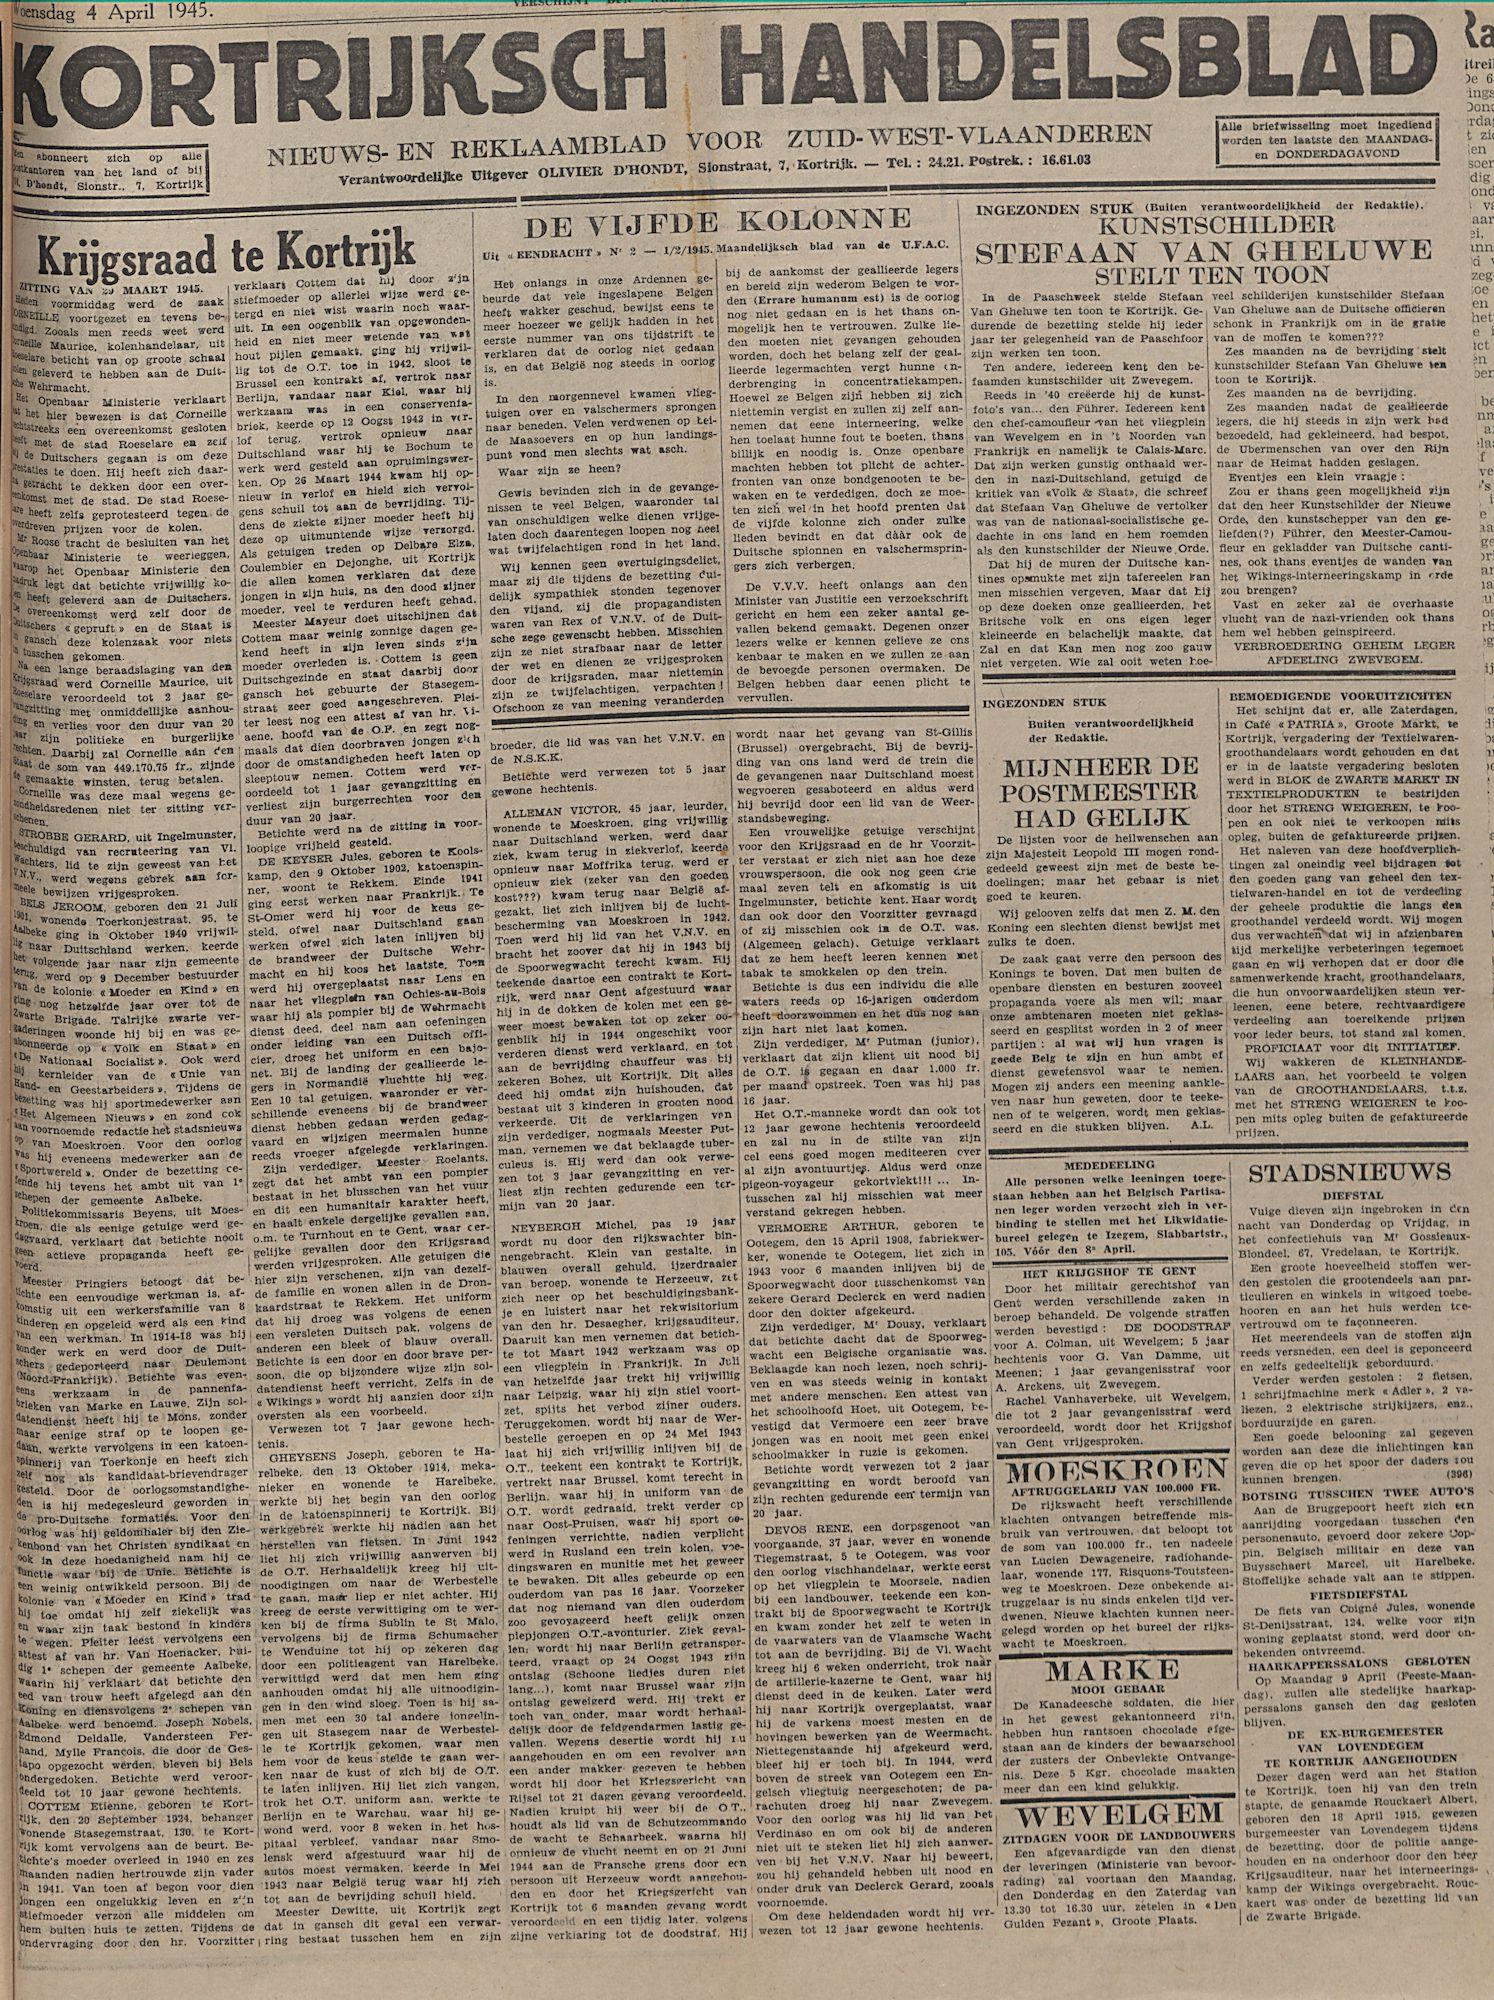 Kortrijksch Handelsblad 4 april 1945 Nr27 p1